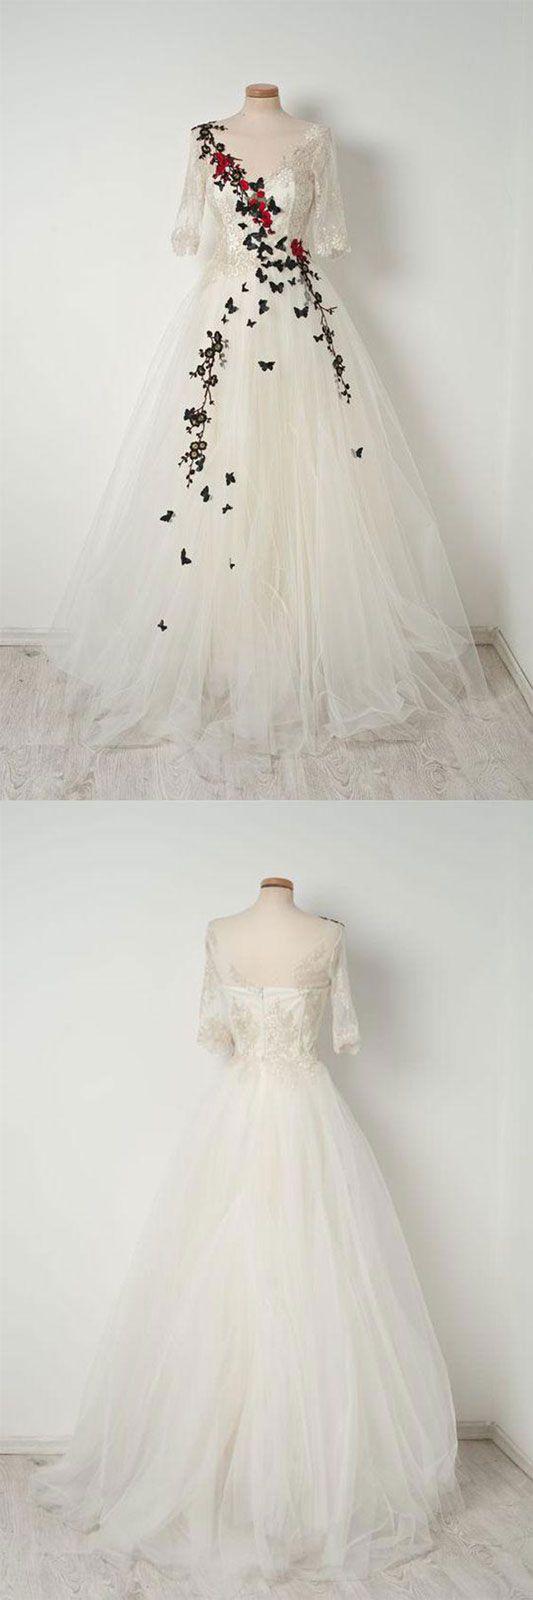 White v neck tulle lace long prom dress, white evening dress